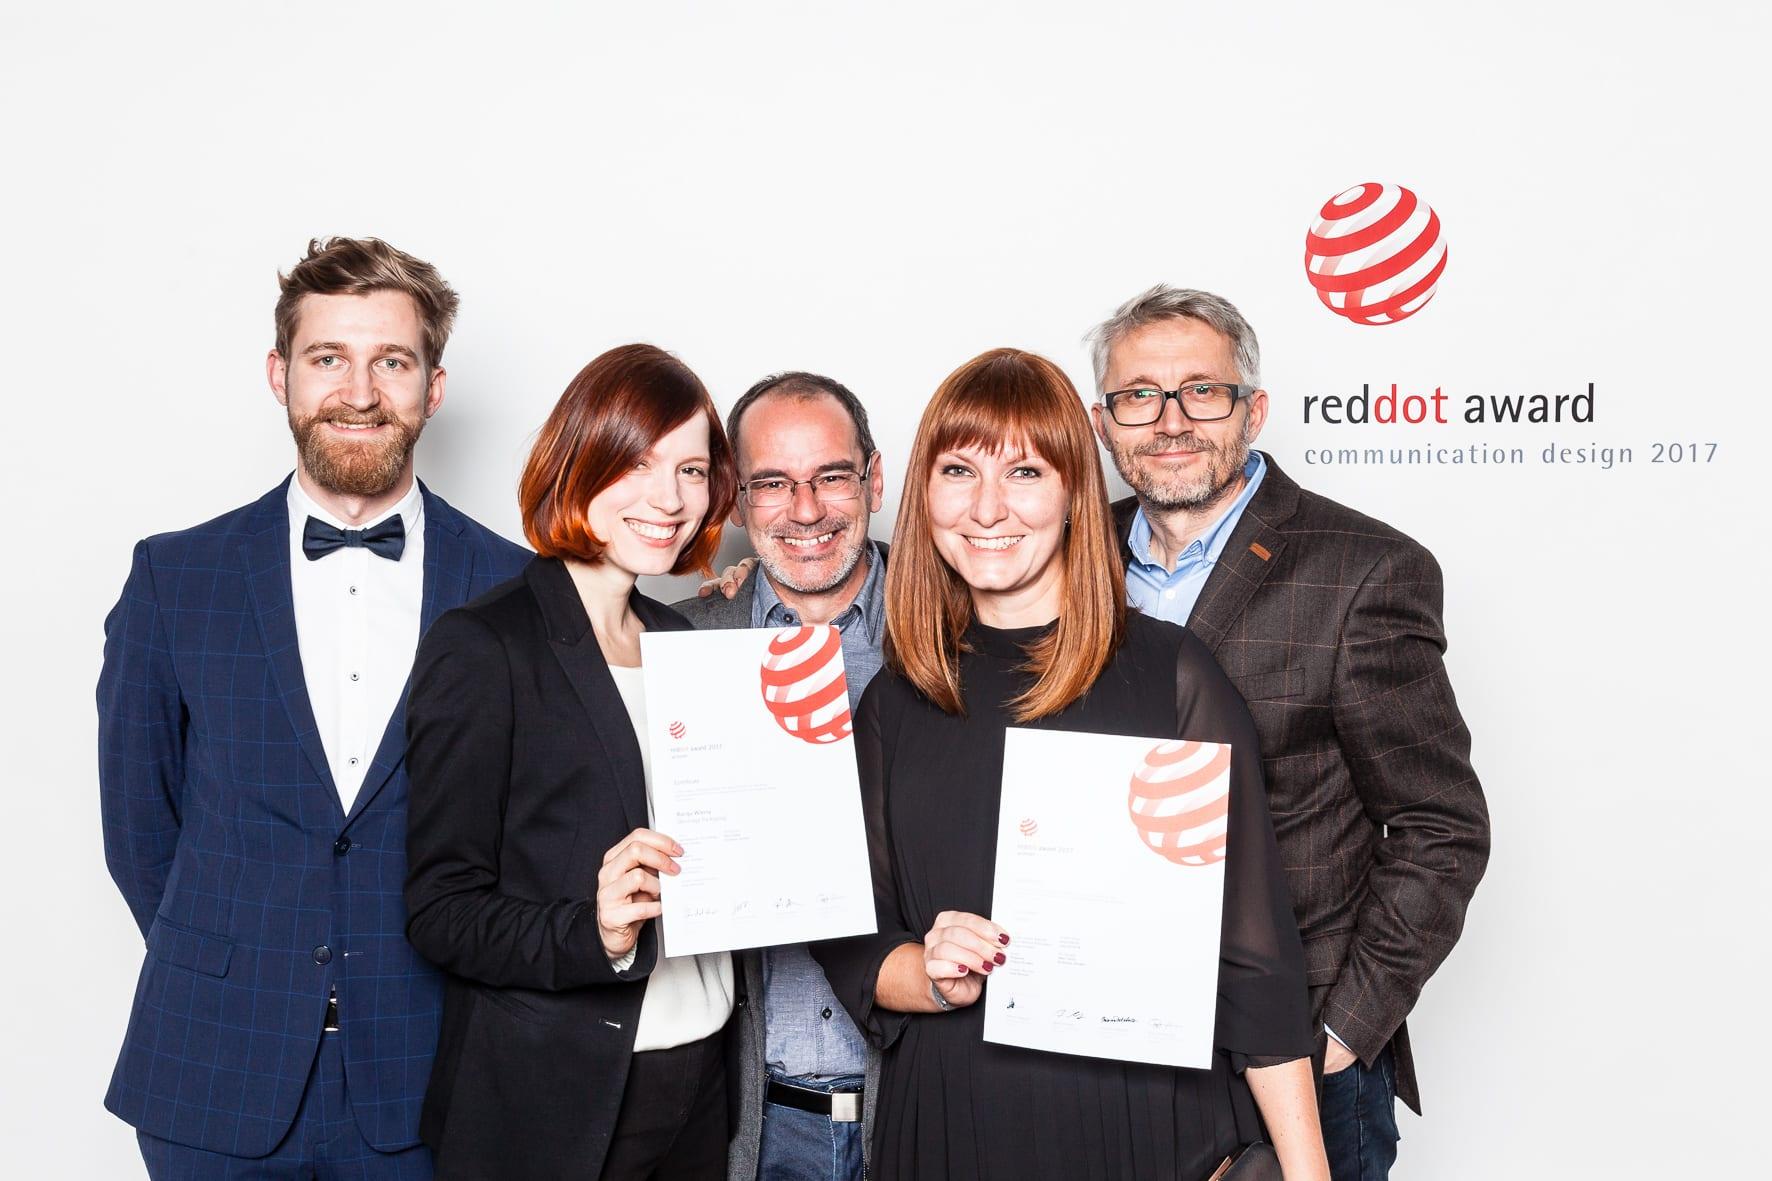 201 RD CD 2017 Urkunden IMG 0589 - Štúdio Pergamen si prinieslo z Berlína ocenenie Red Dot za dizajn vína a Biblie